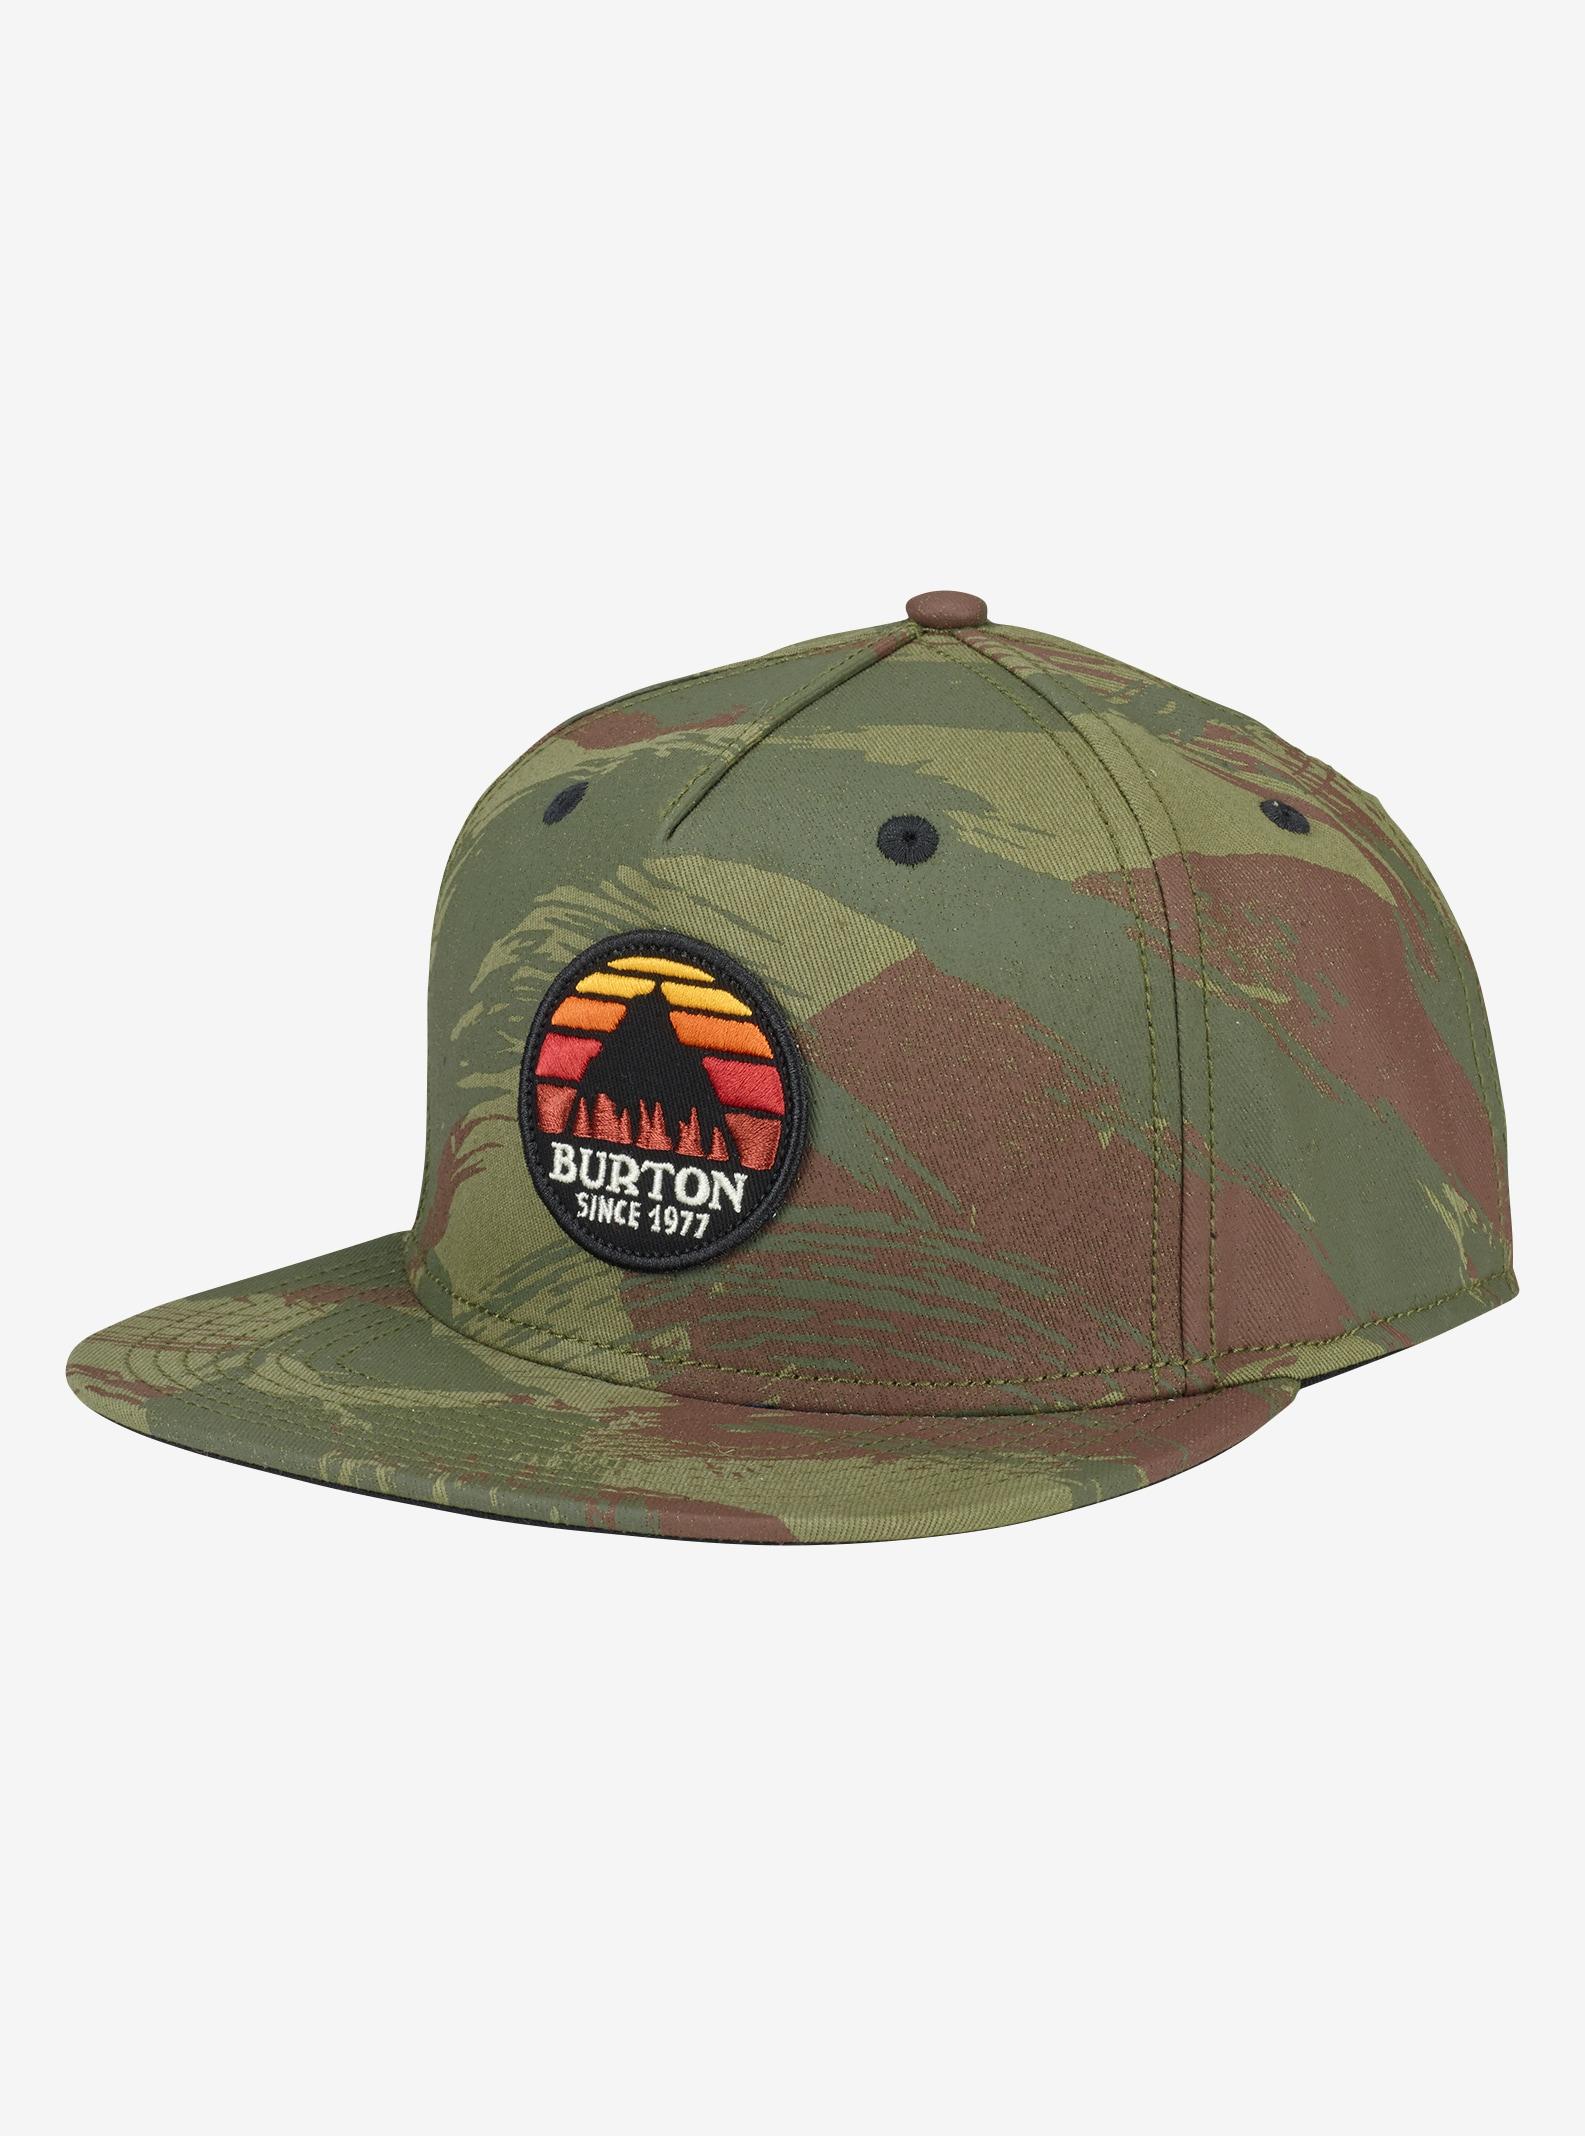 Men's Burton Underhill Hat shown in Brush Camo